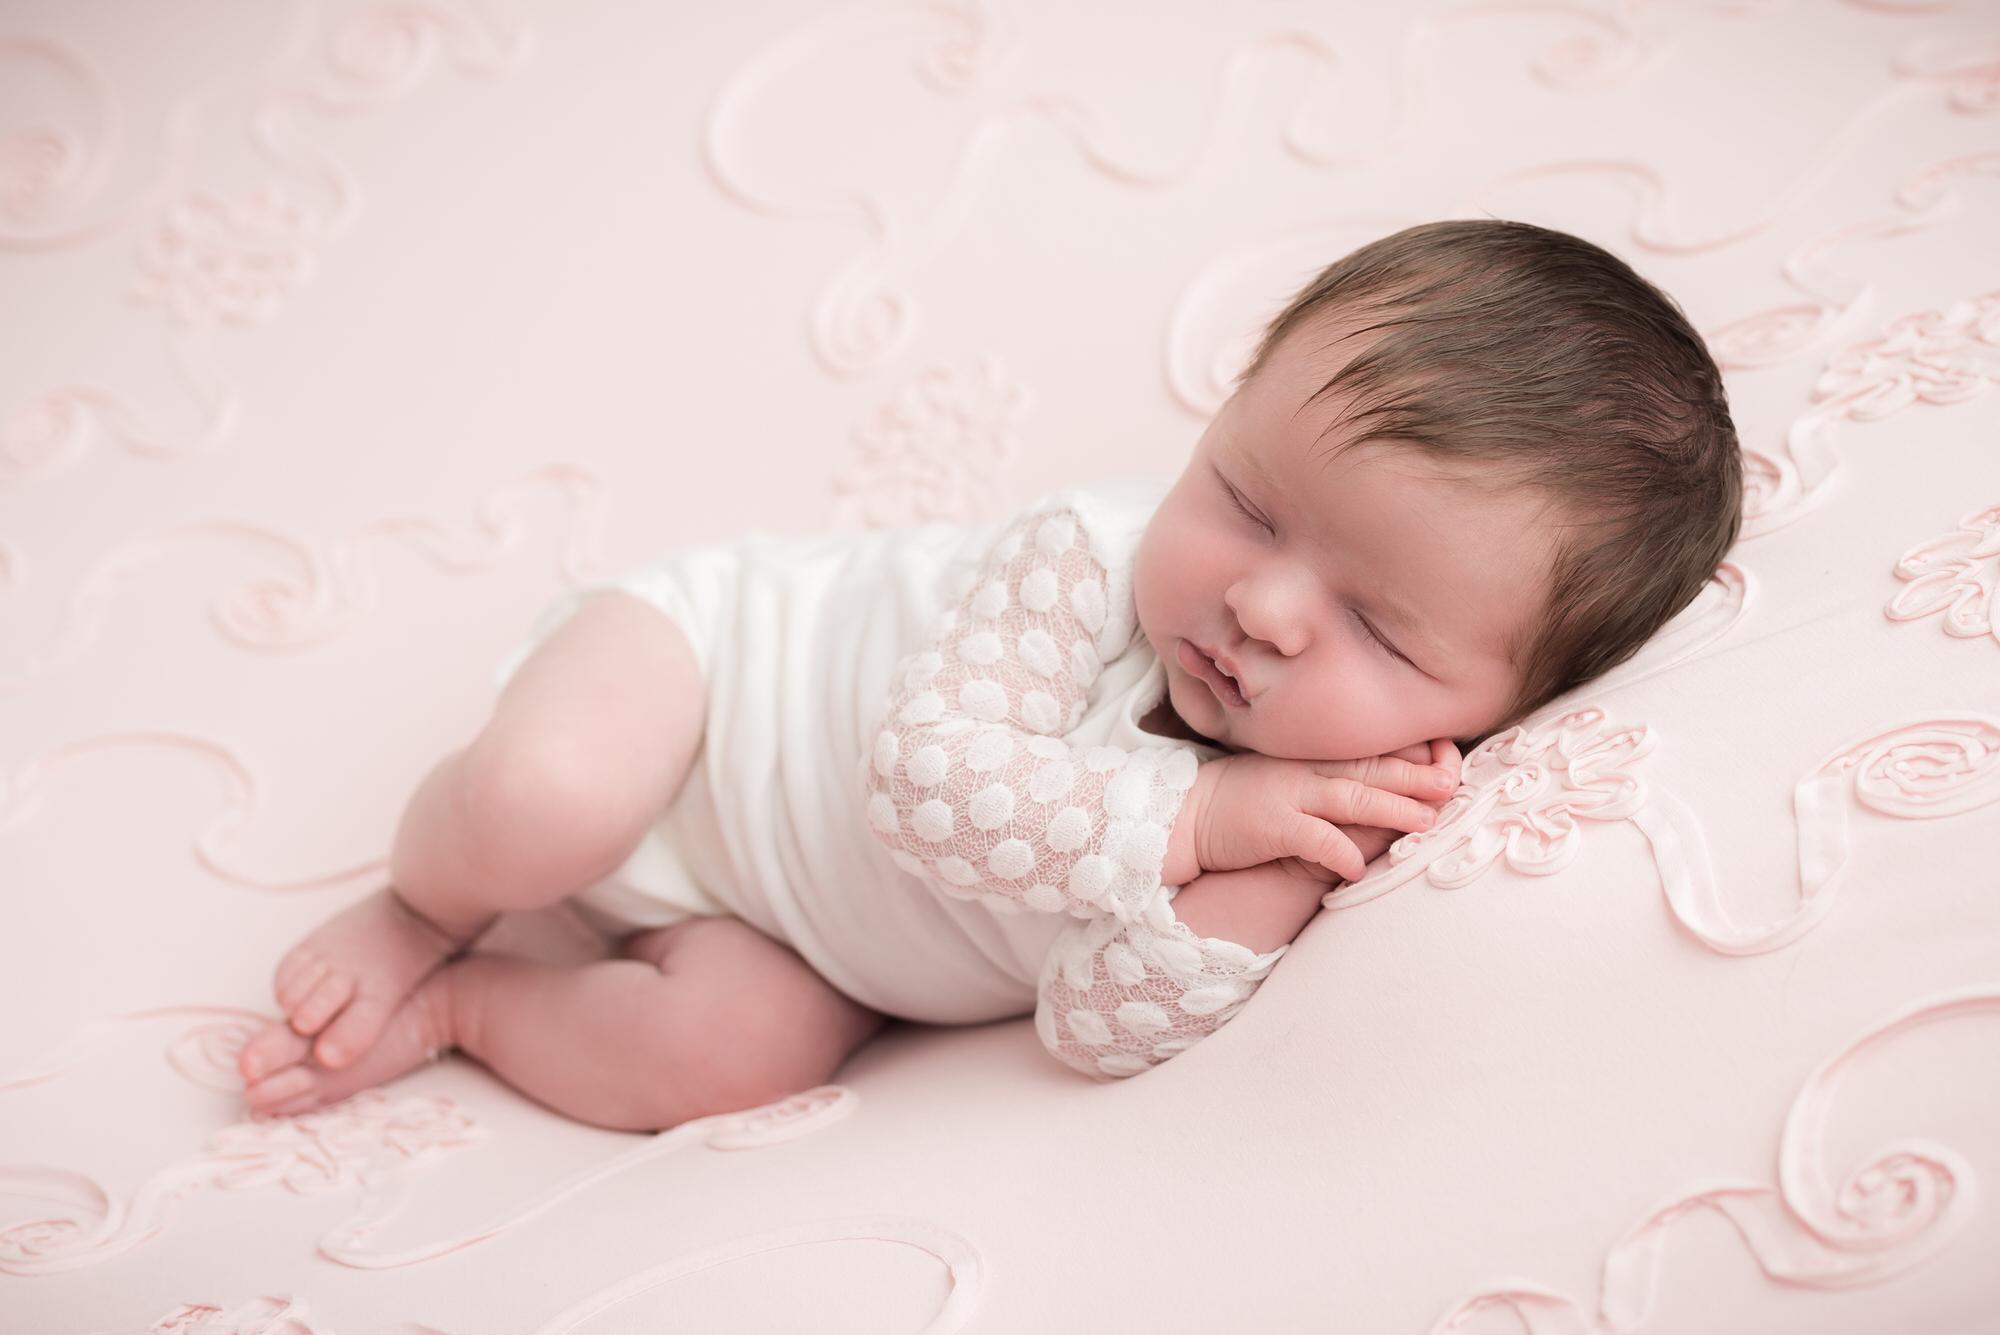 Newborn_baby_photographer_dudley_midlands_posing_on_blanket